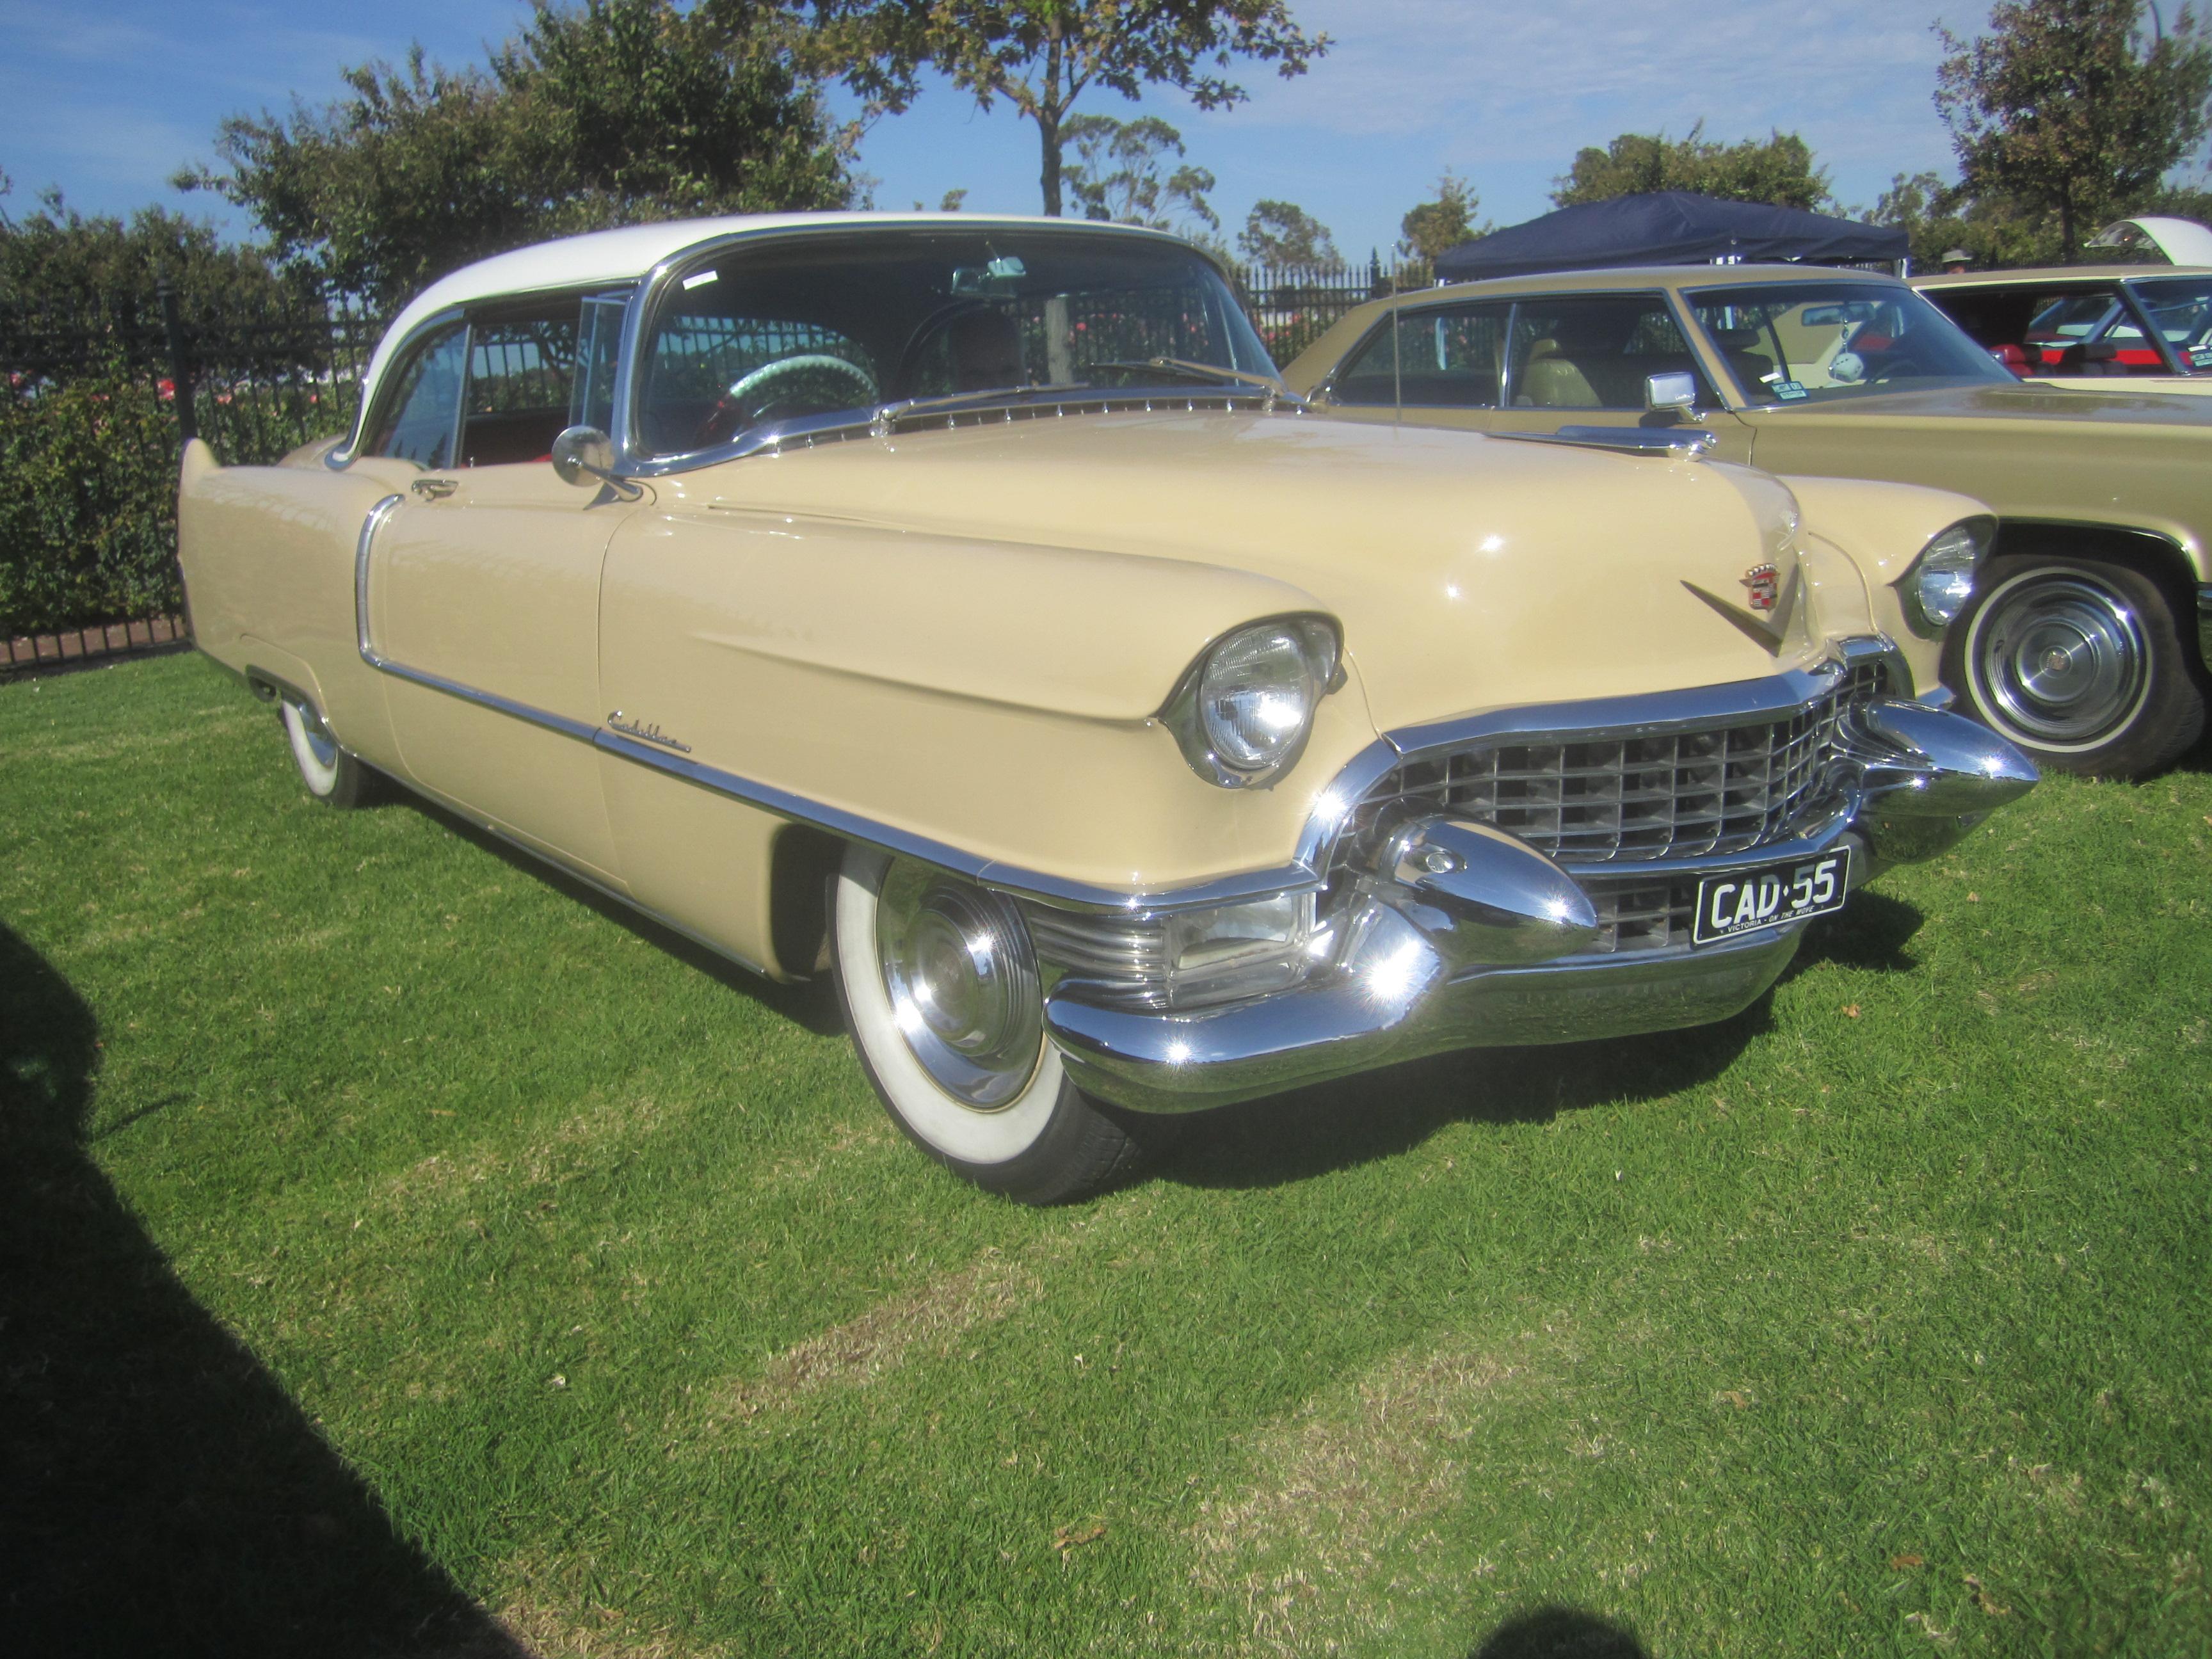 File1955 Cadillac Series 62 2 Door Hardtop 8664112542 1955 Coupe Deville Convertible